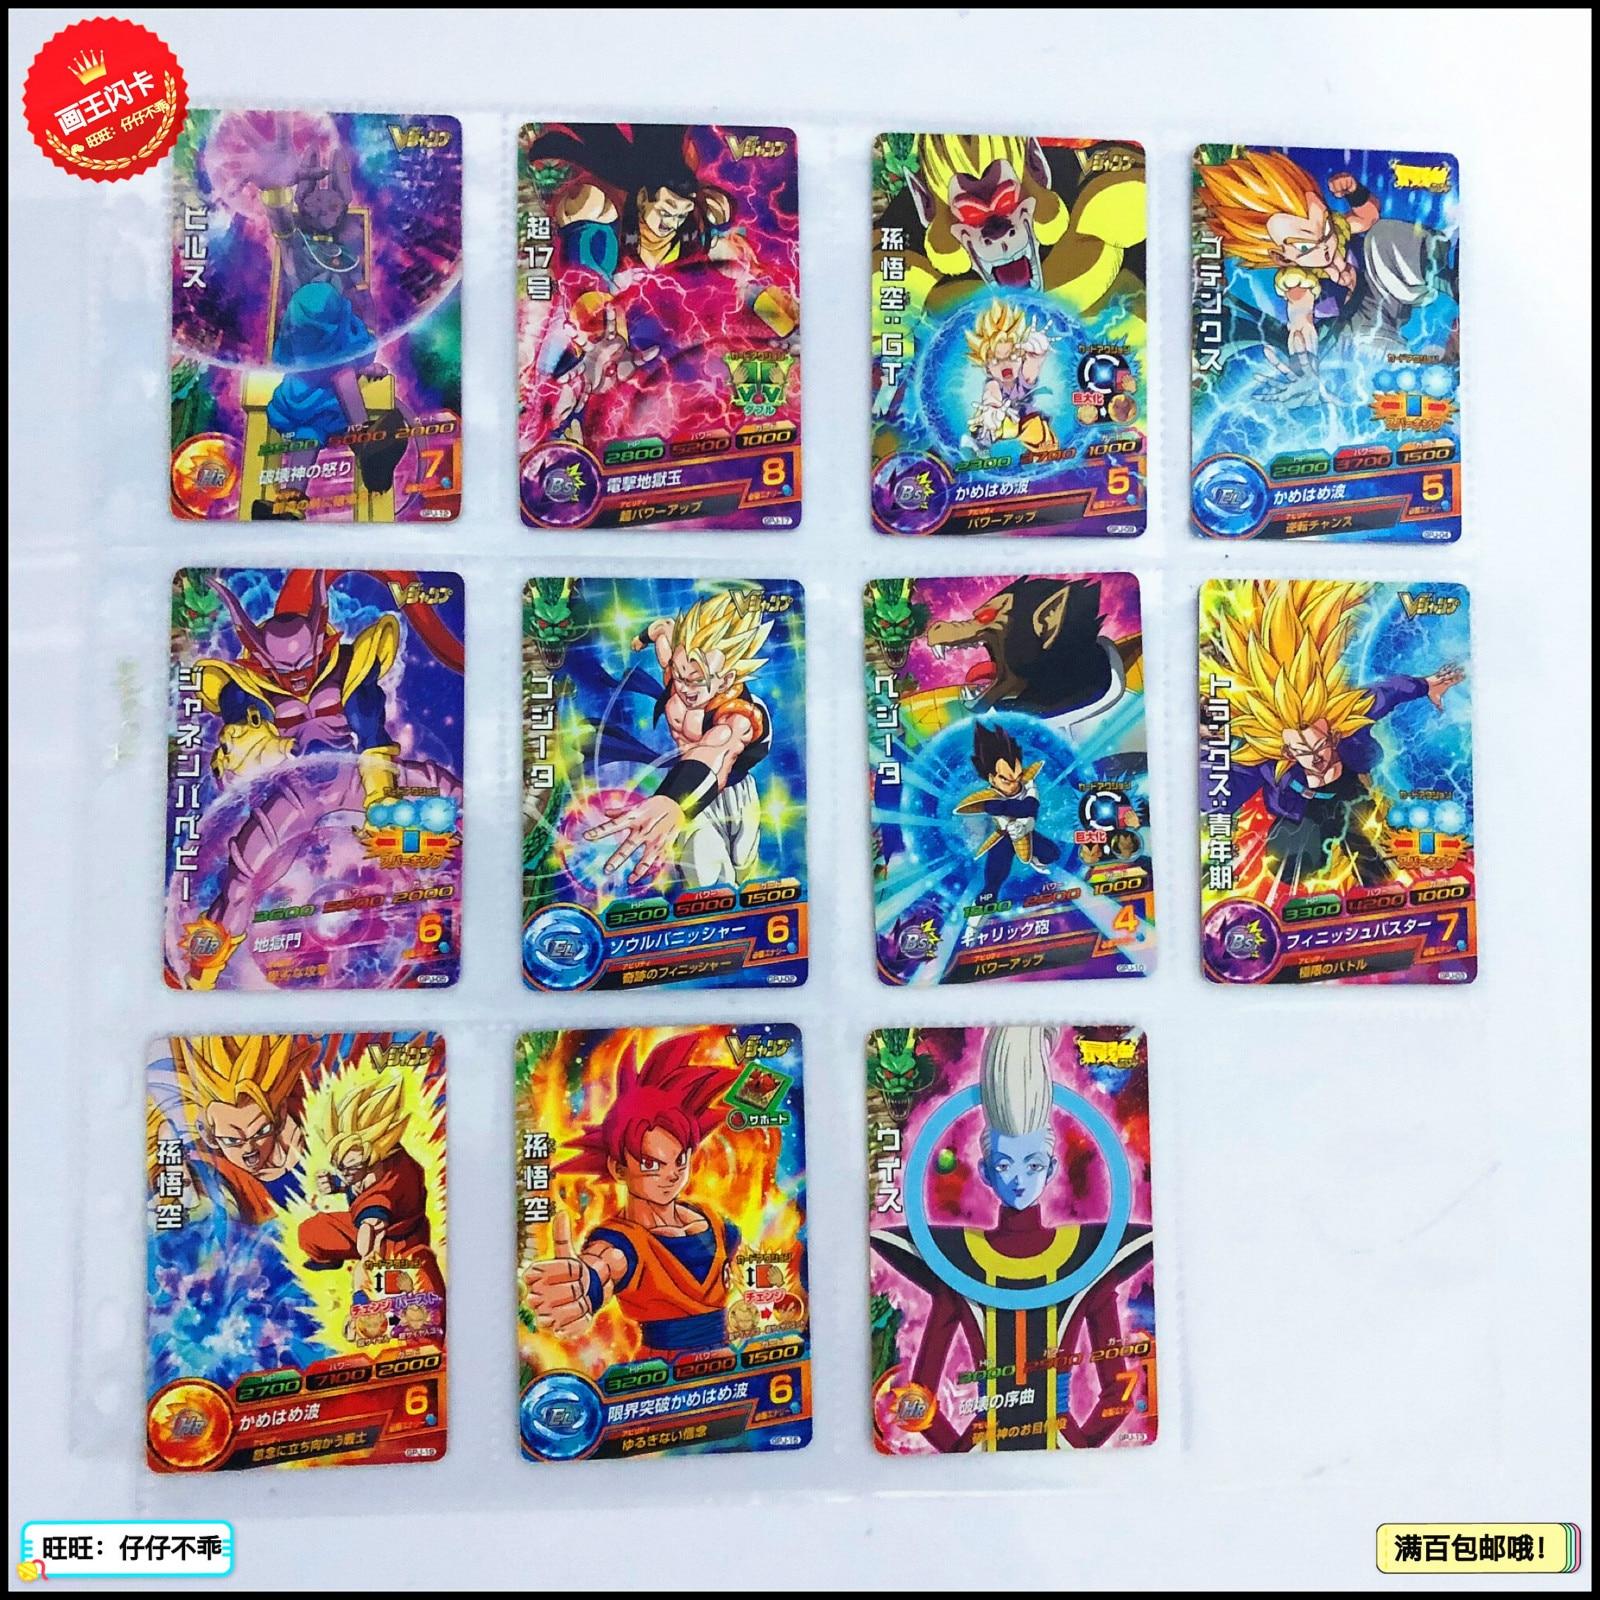 Japan Original Dragon Ball Hero Card GPJ Goku Toys Hobbies Collectibles Game Collection Anime Cards